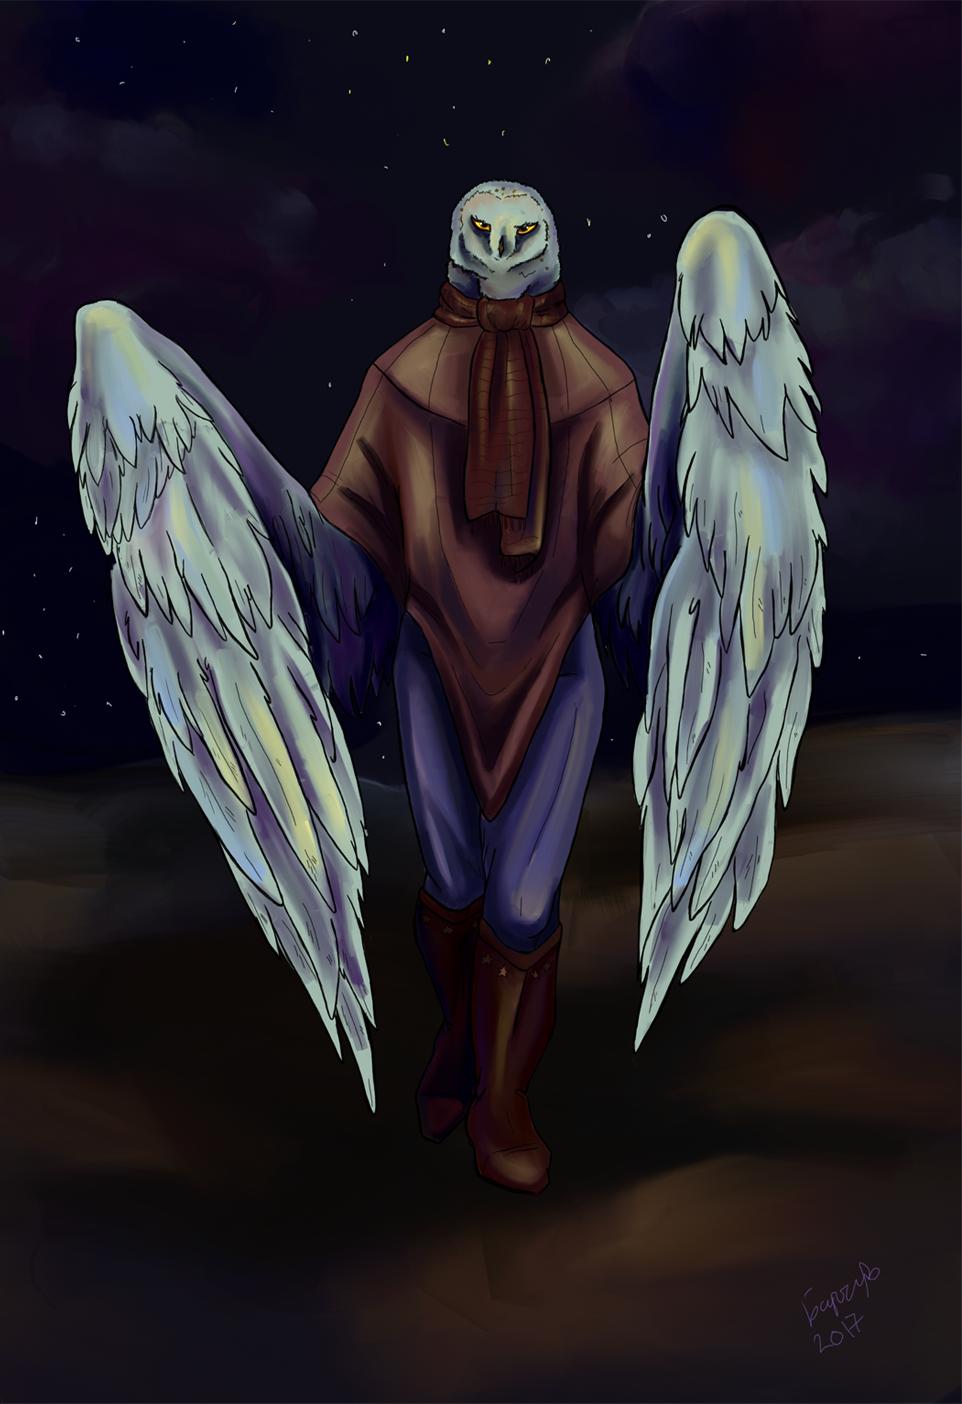 Owl by zoiocen